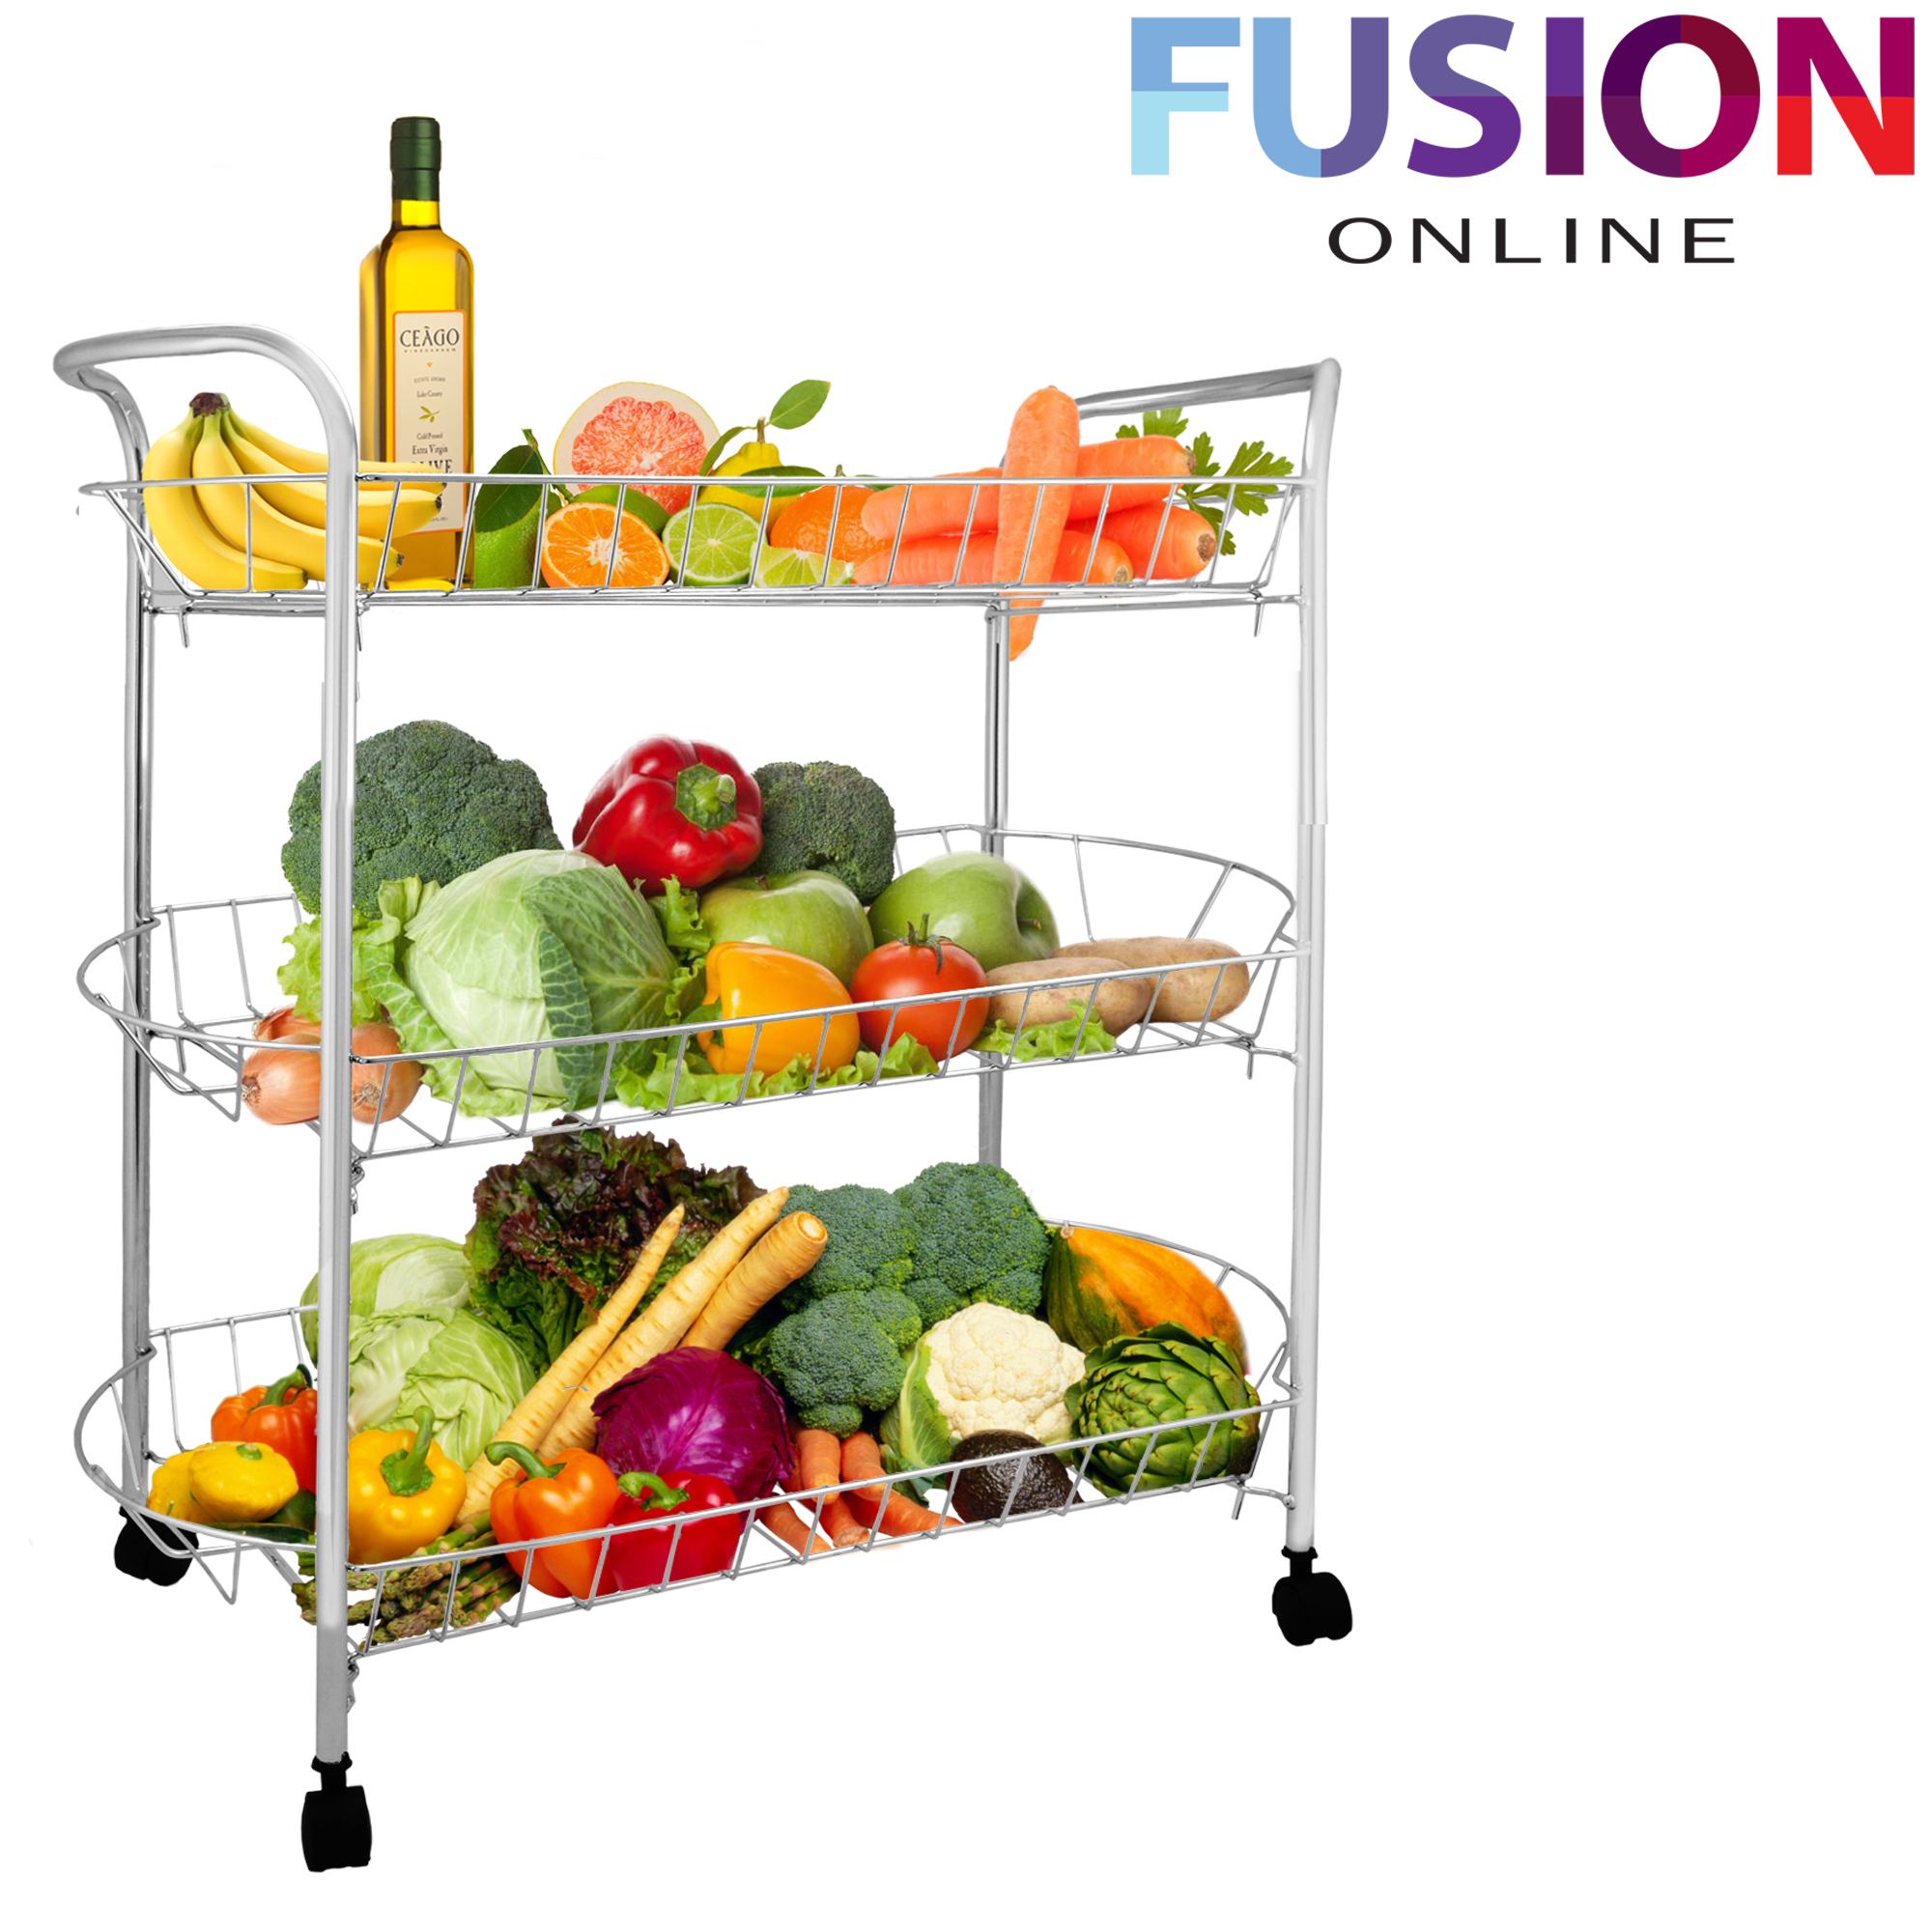 3 Tier Chrome Fruit Vegetable Rack W Wheels Storage Stand Cart Trolley Kitchen Ebay